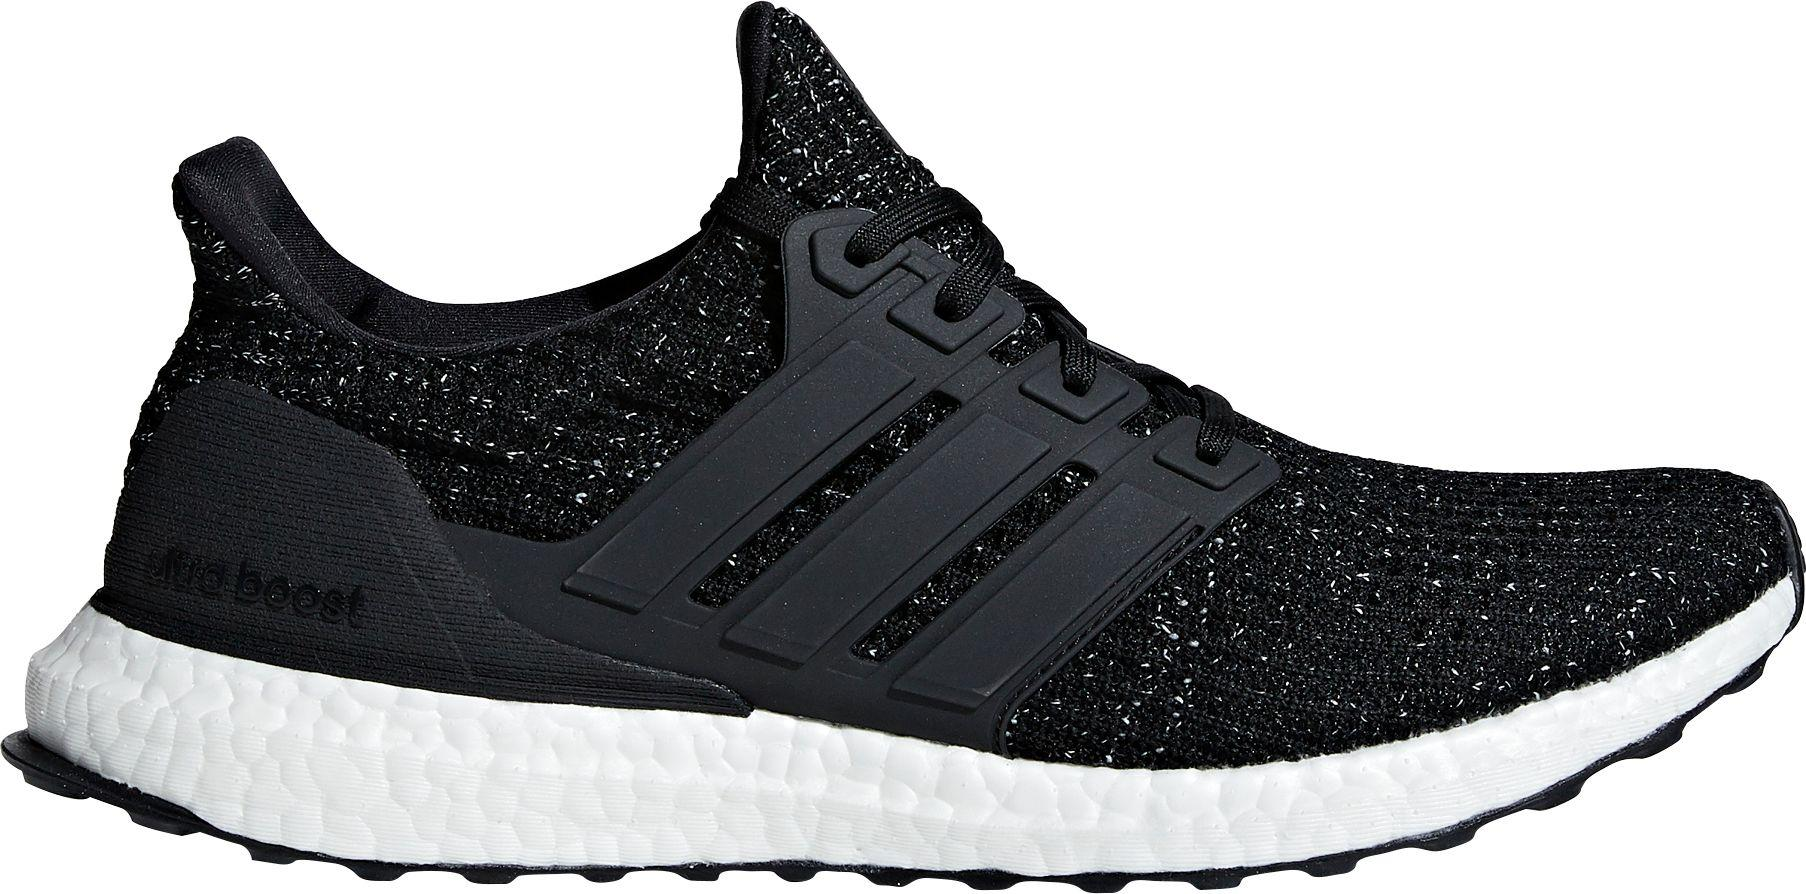 dde022f5f955b Lyst - adidas Ultraboost Running Shoes in Black for Men